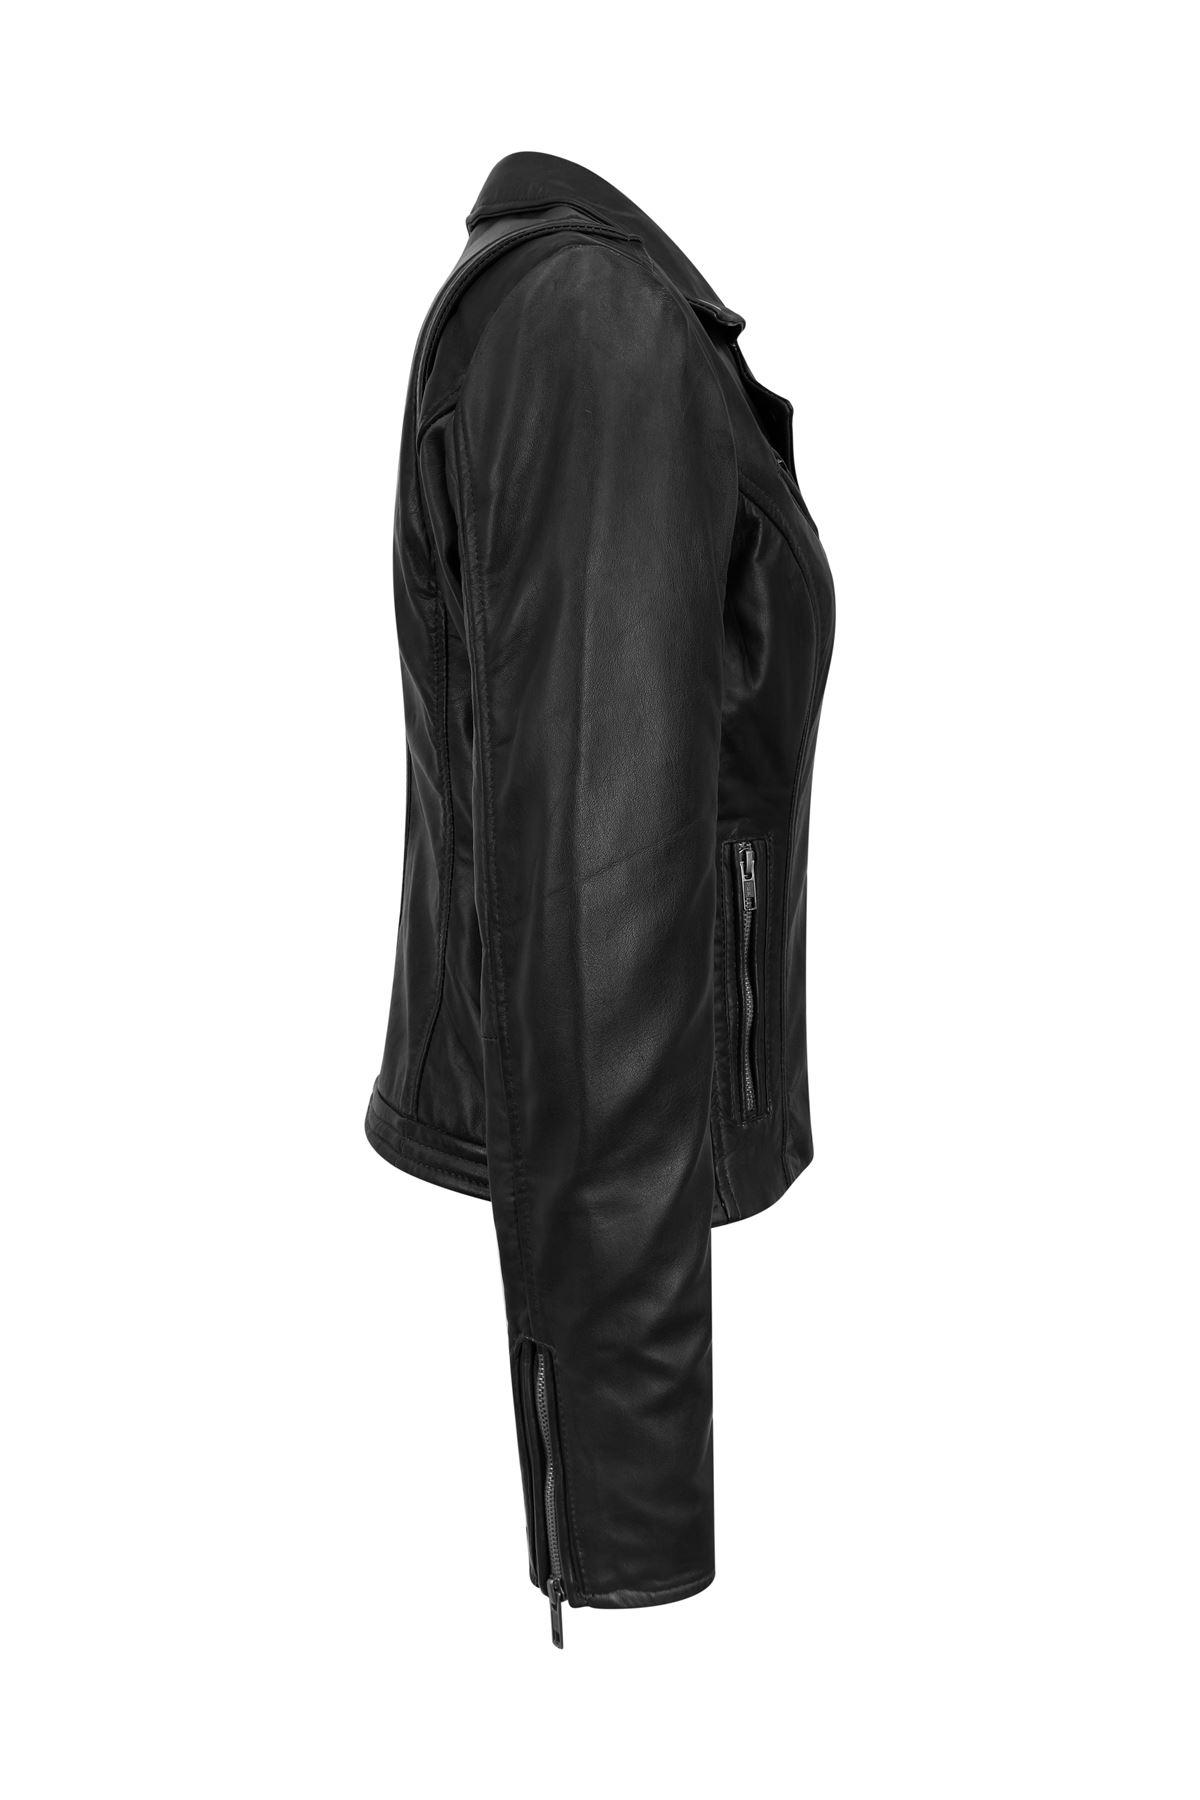 Blouson-femme-cuir-Napa-veritable-fermeture-zip-diagonale-ajuste miniature 8